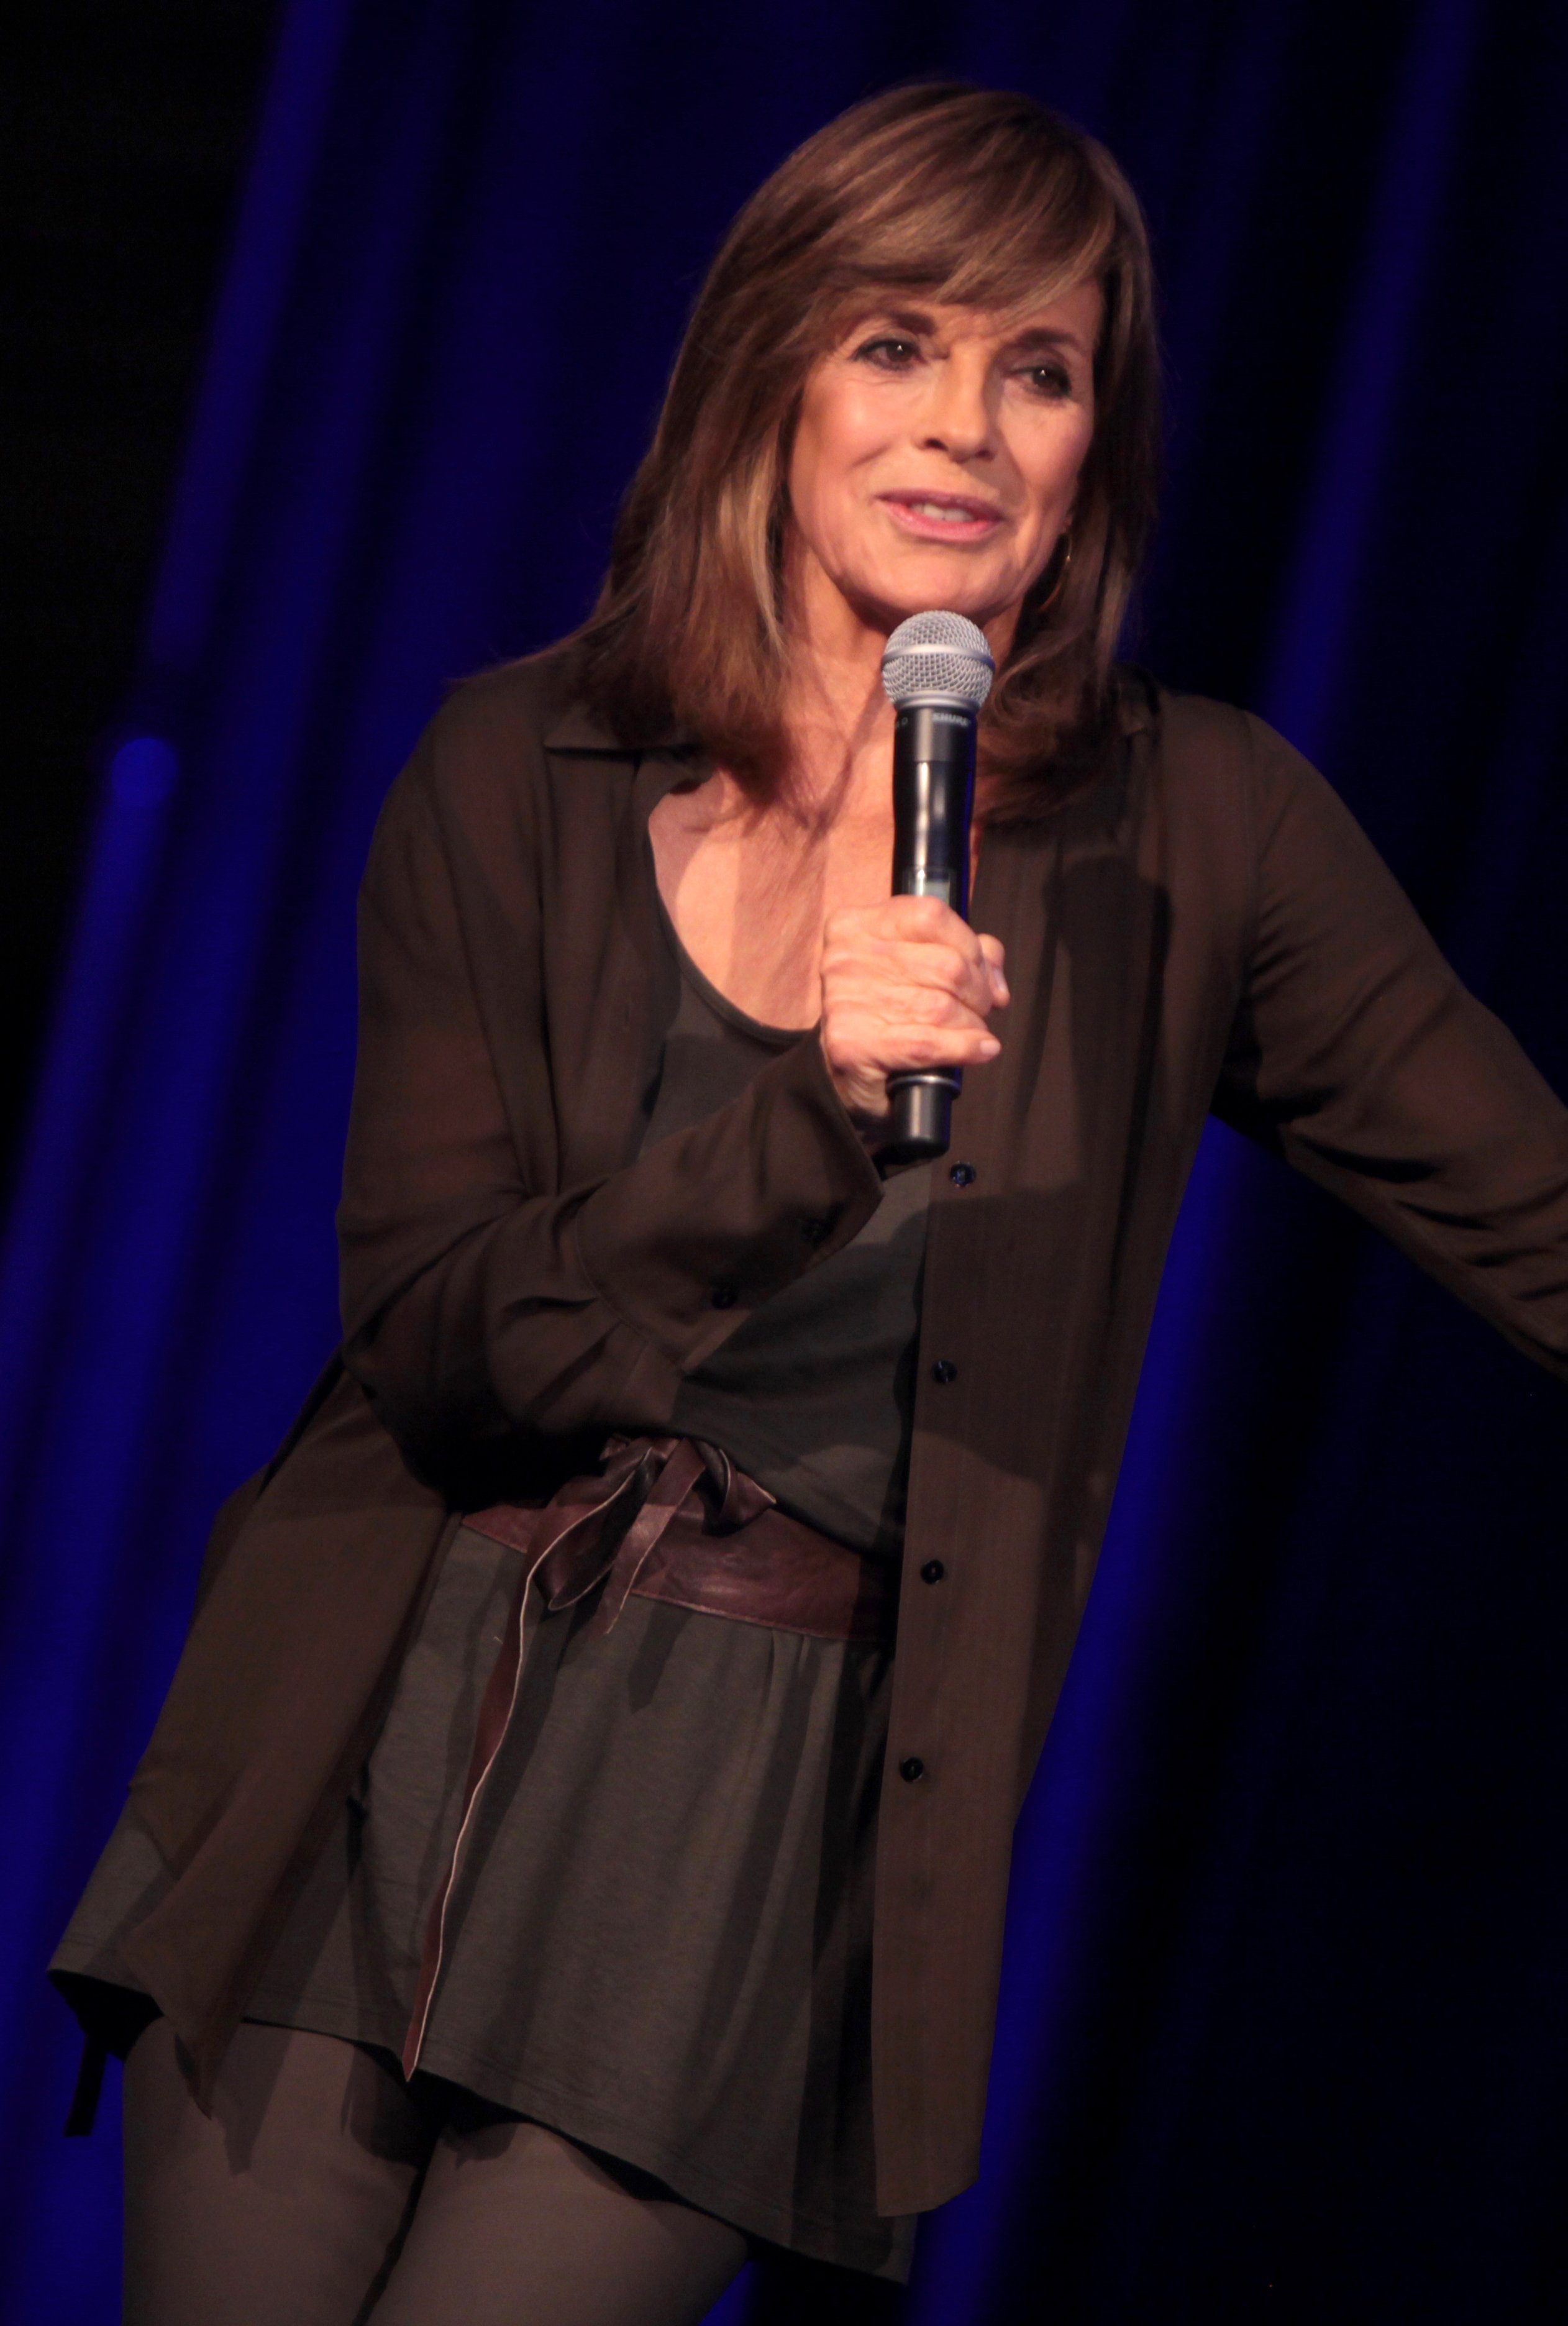 Linda Gray at the 2014 Arizona Ultimate Women's Expo in Phoenix, Arizona. | Photo: Wikimedia Commons